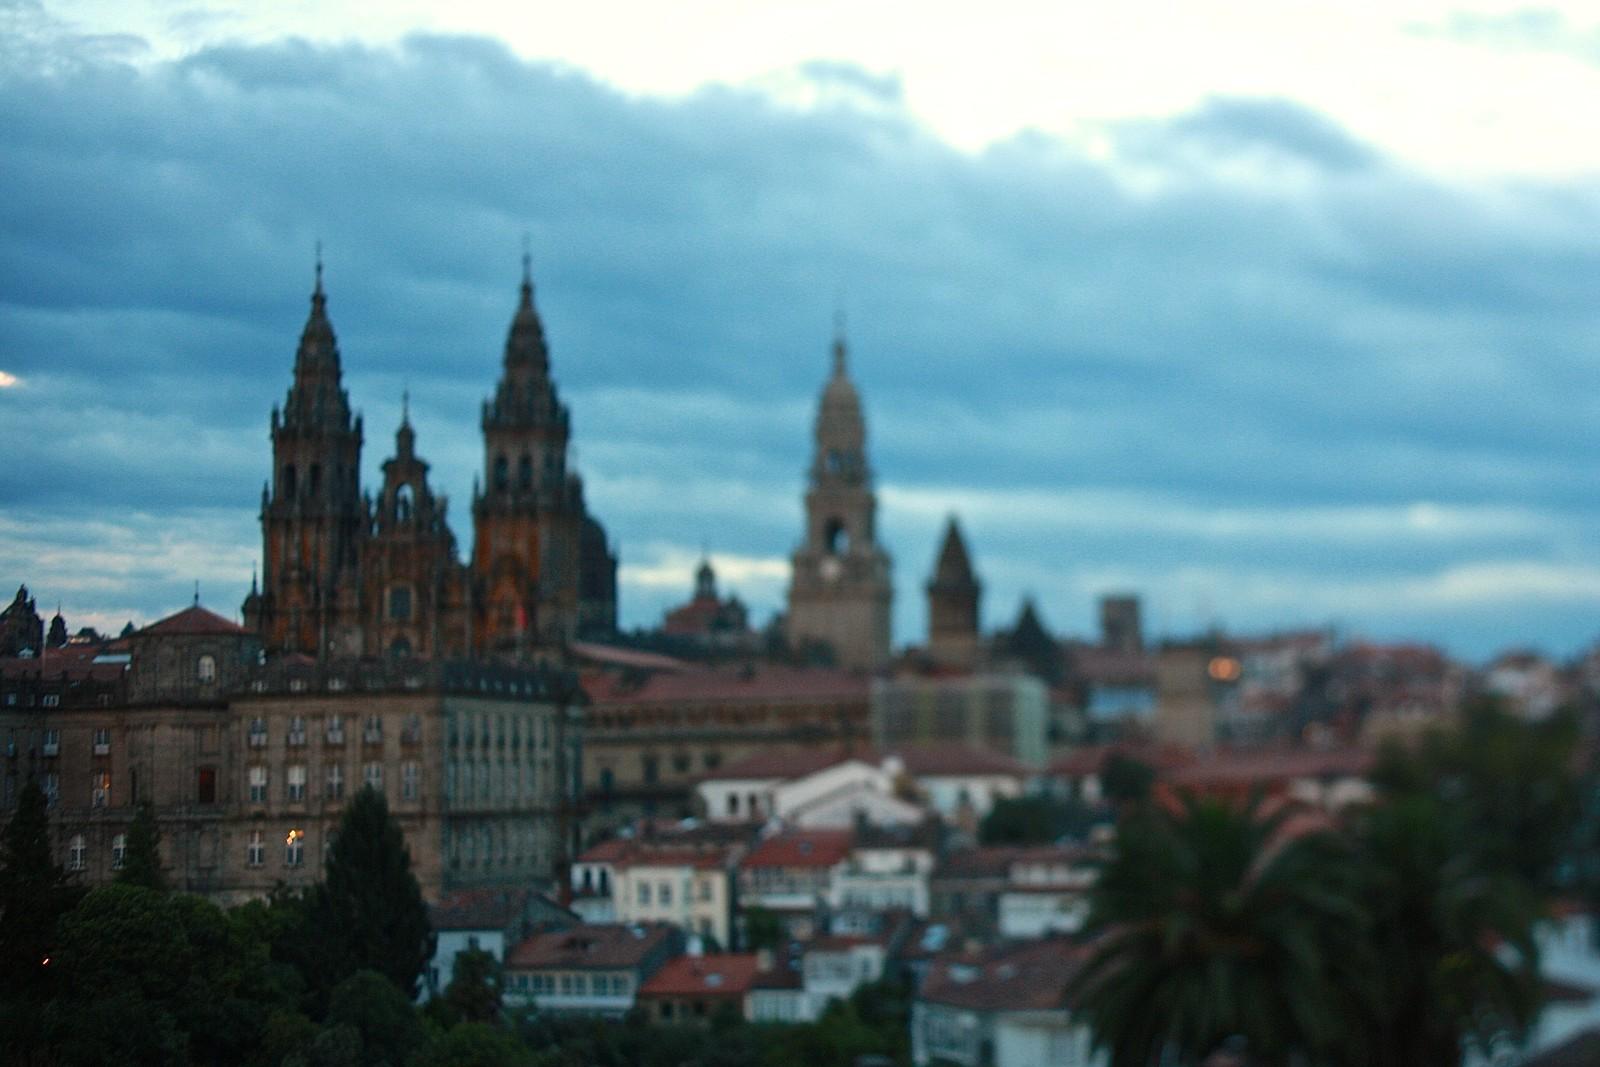 Santiago de Compostela cathedral at dusk